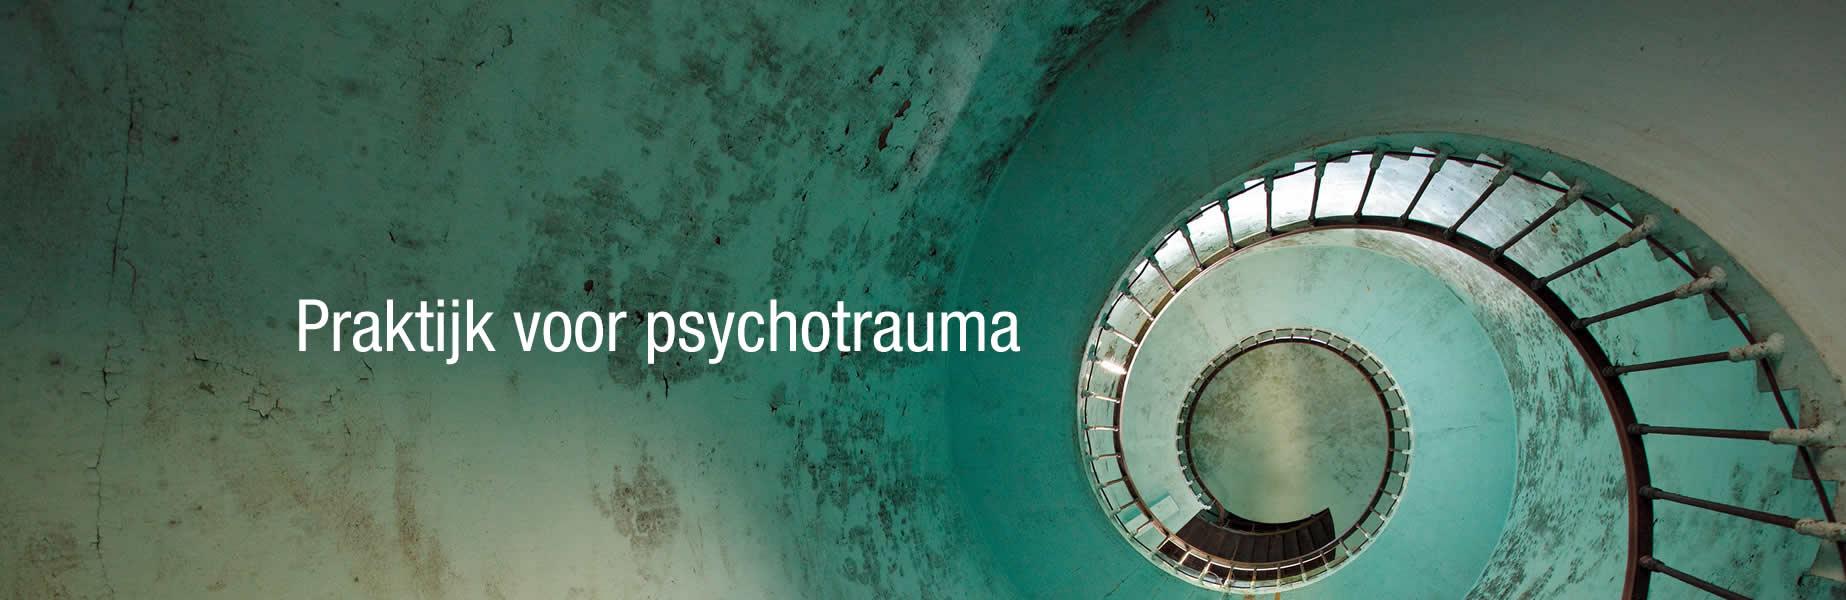 praktijk voor psychotrauma